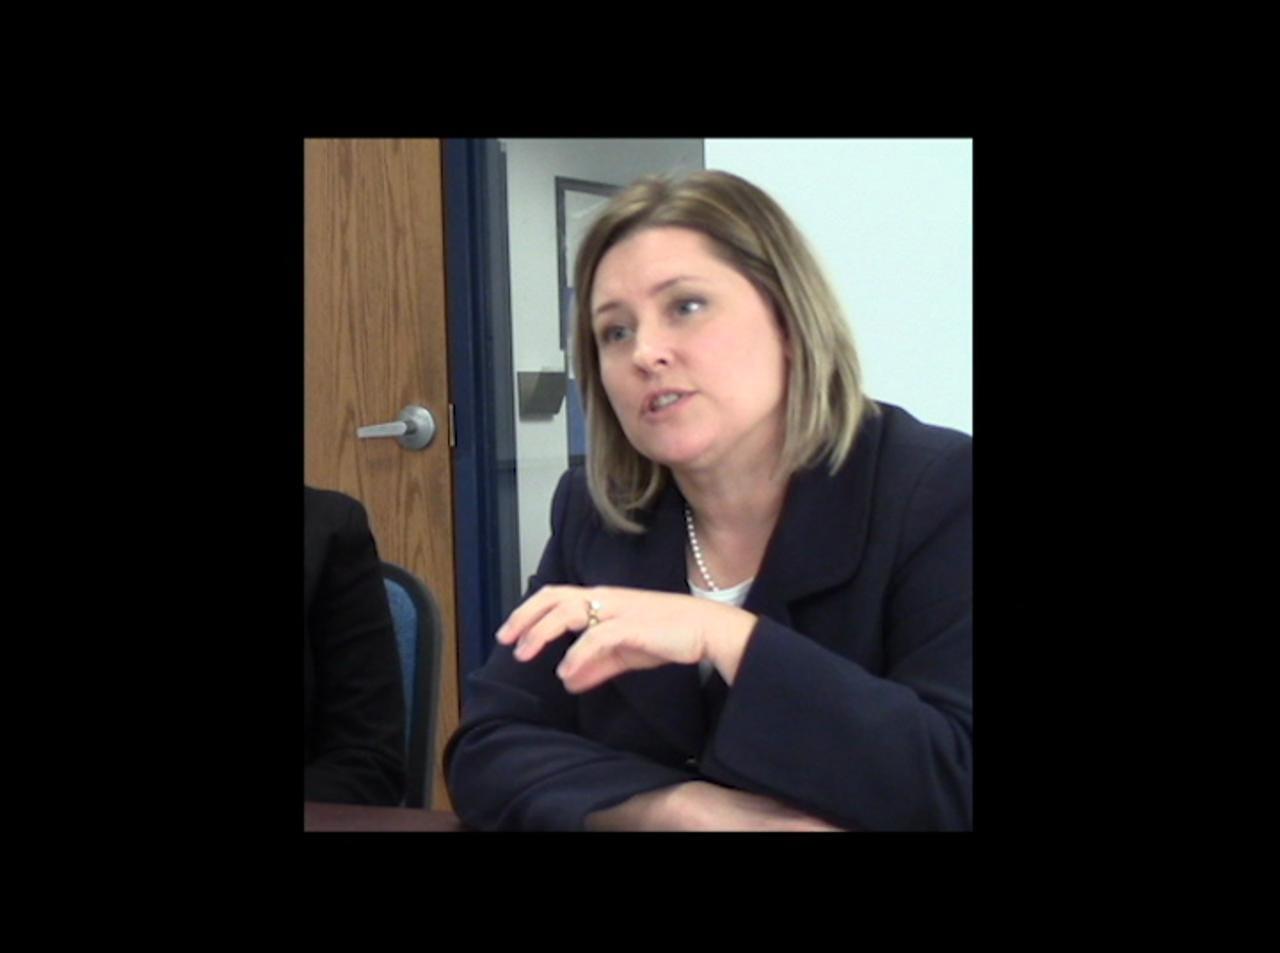 Sen. Julie Lassa spoke to Gannett Central Wisconsin Media ahead of Gov. Scott Walker's 2015 budget address.